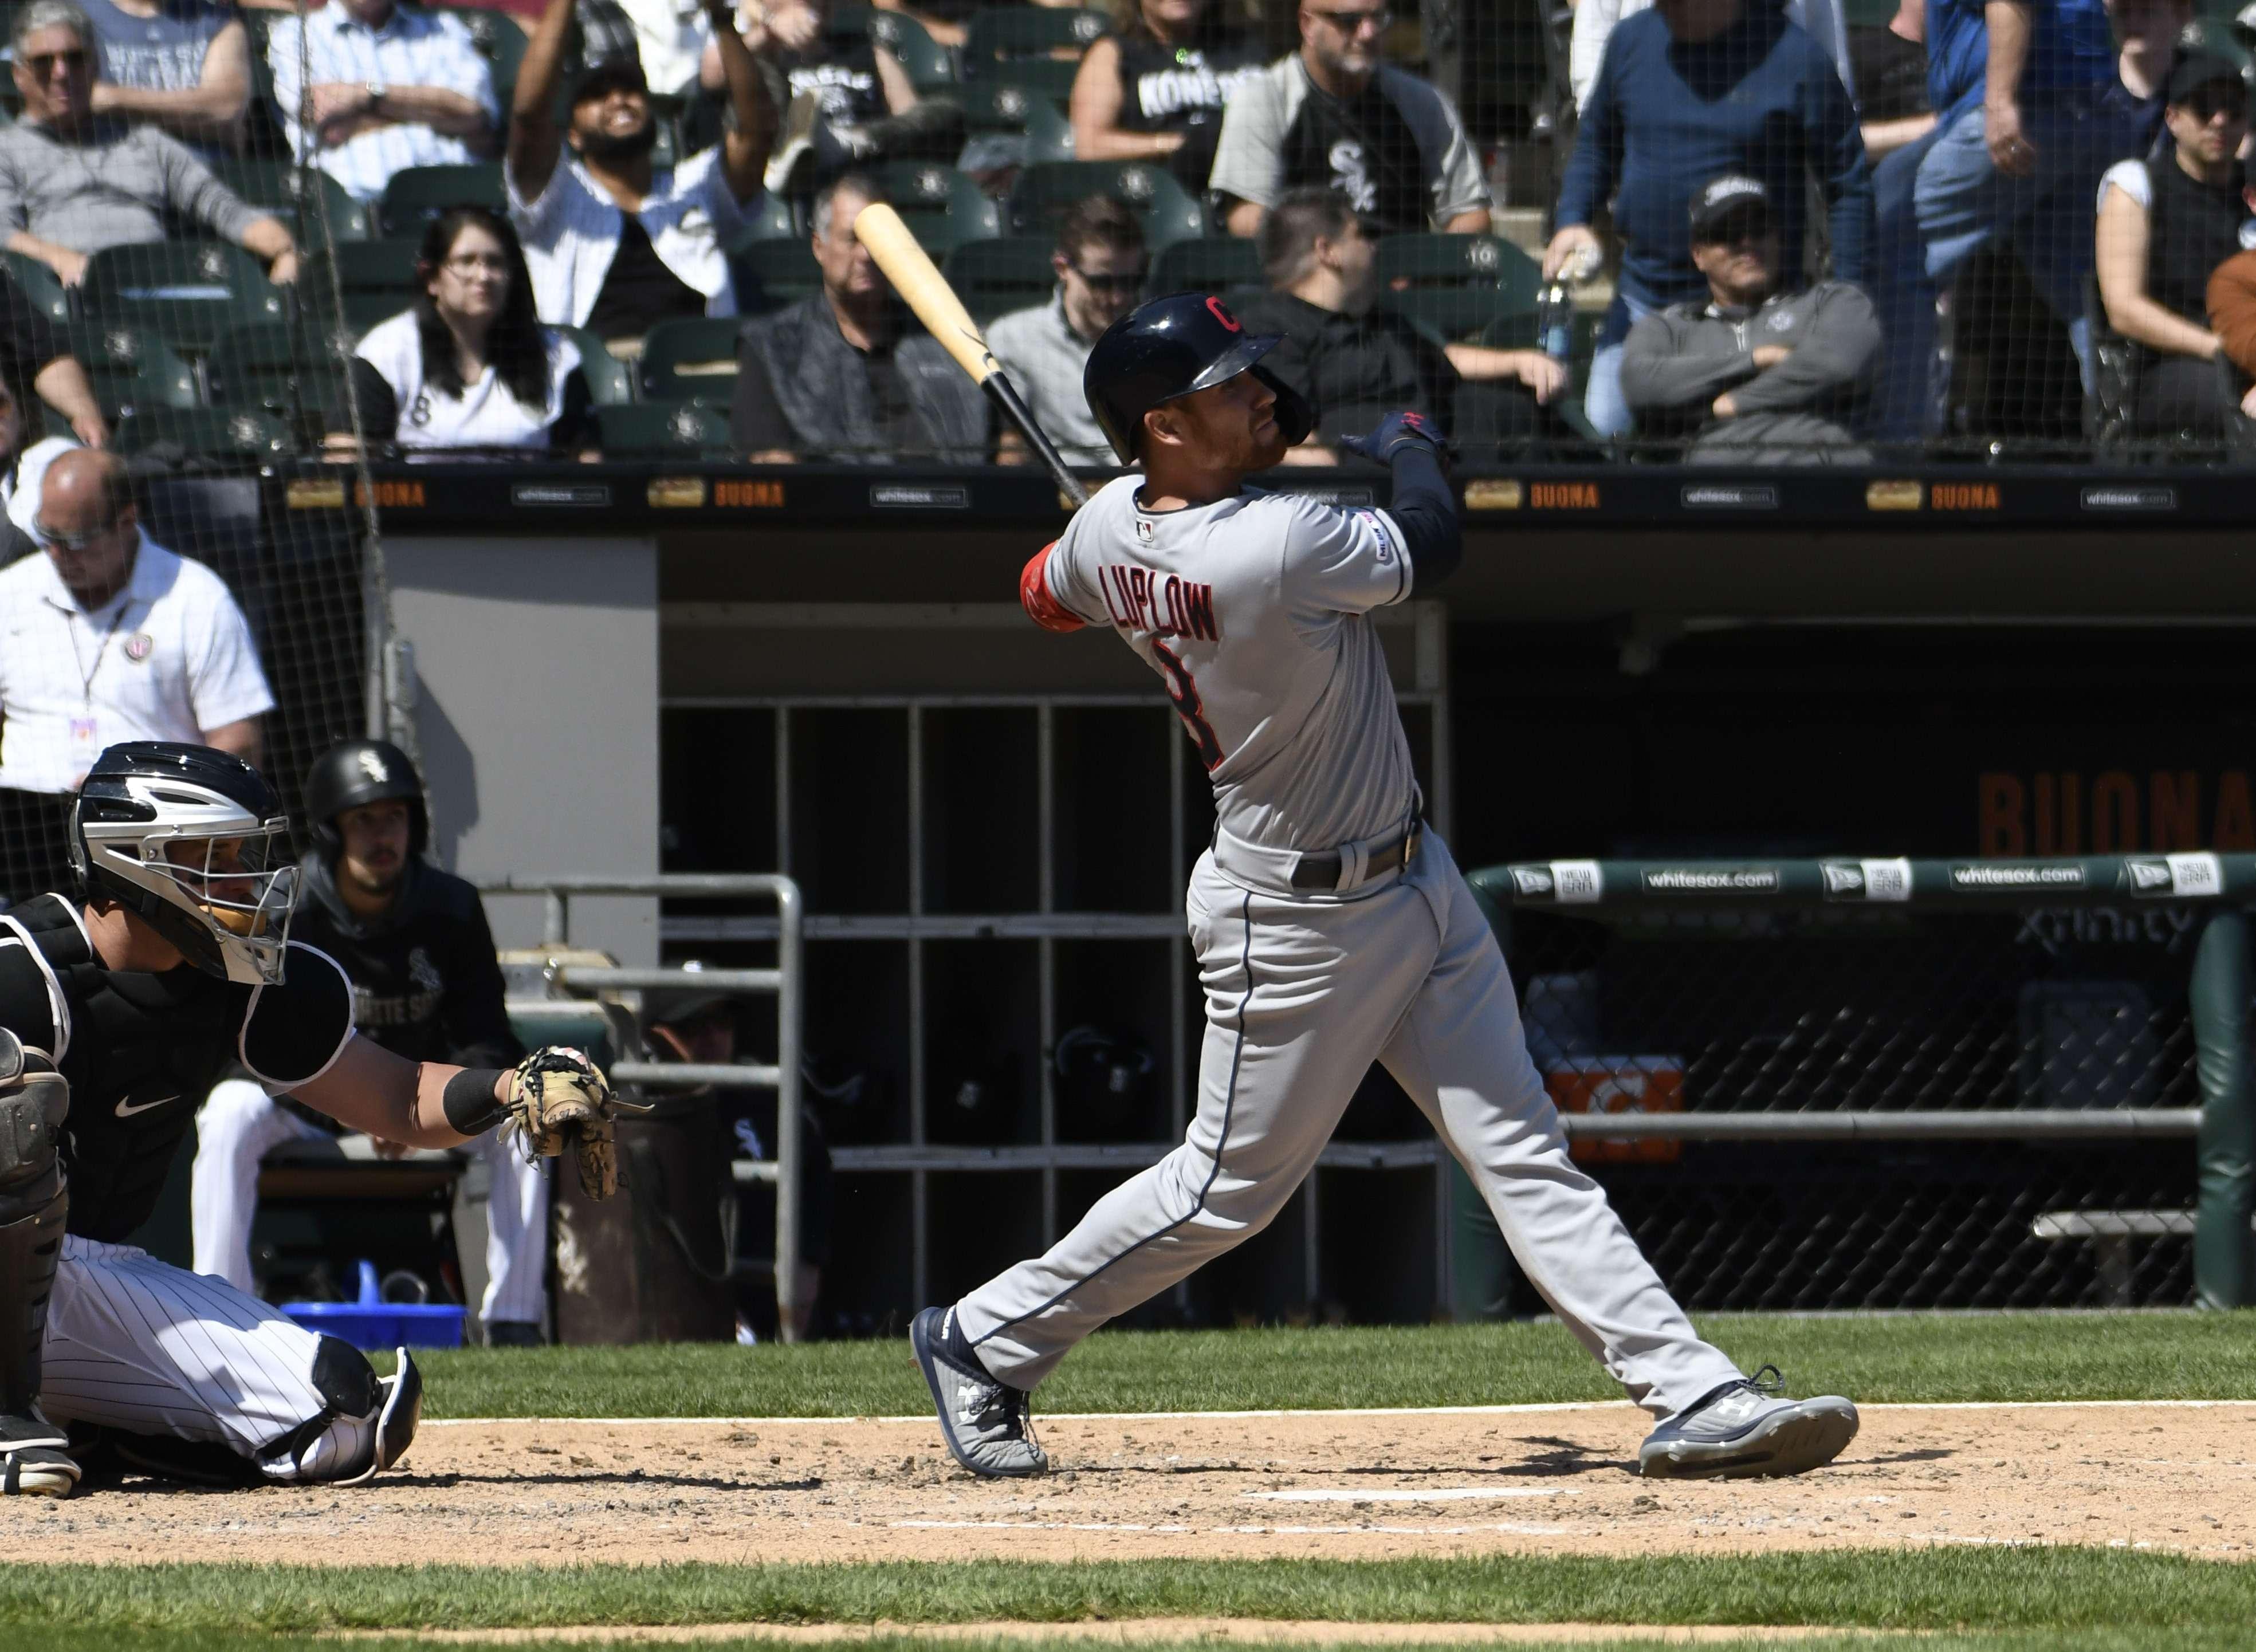 Luplow logra 2 de 5 jonrones de Indios, que vencen a Chicago